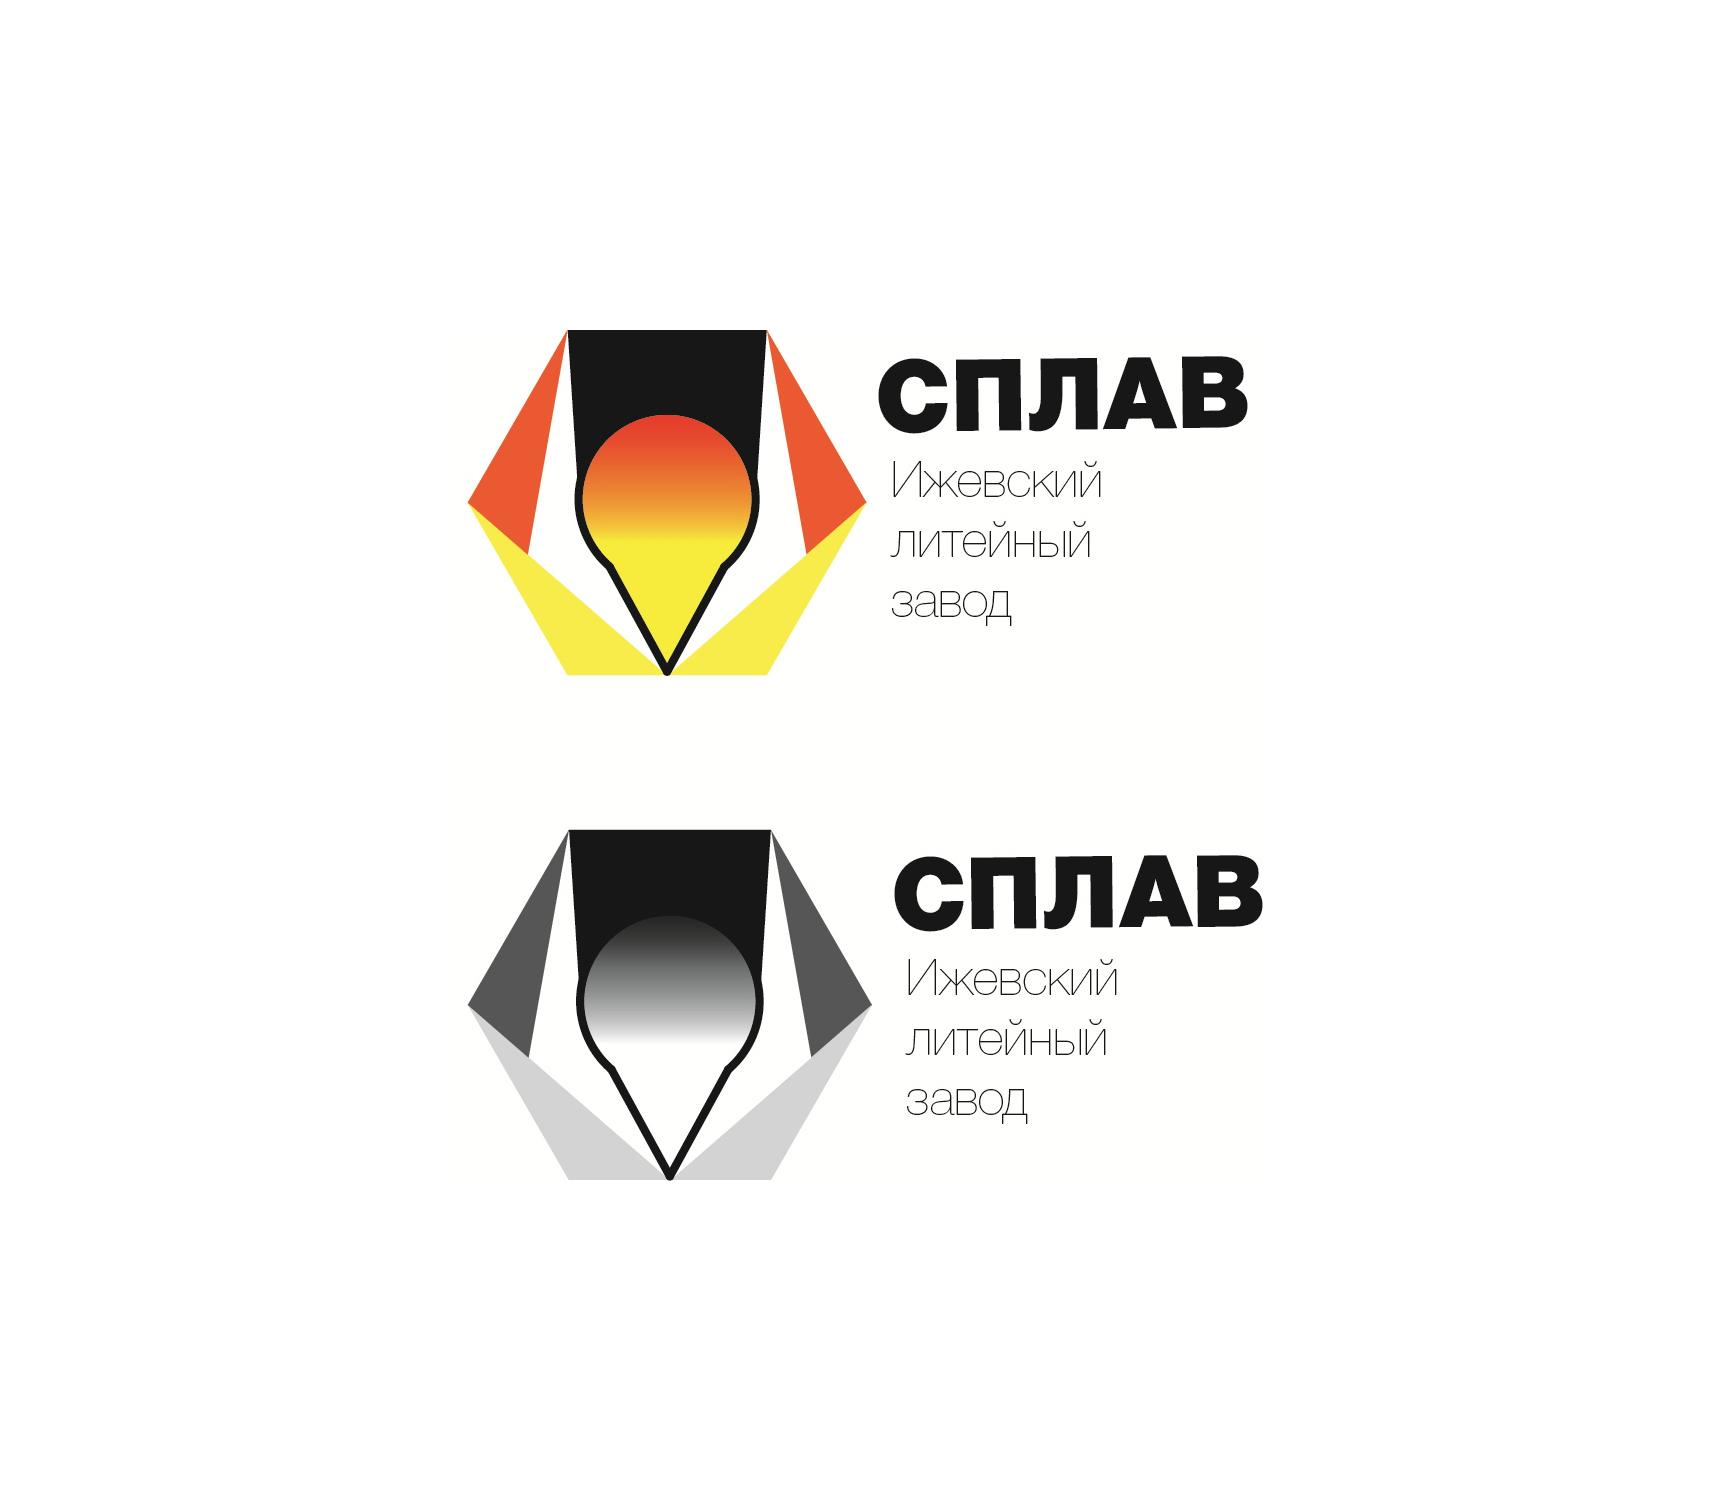 Разработать логотип для литейного завода фото f_3015afc47357e604.jpg